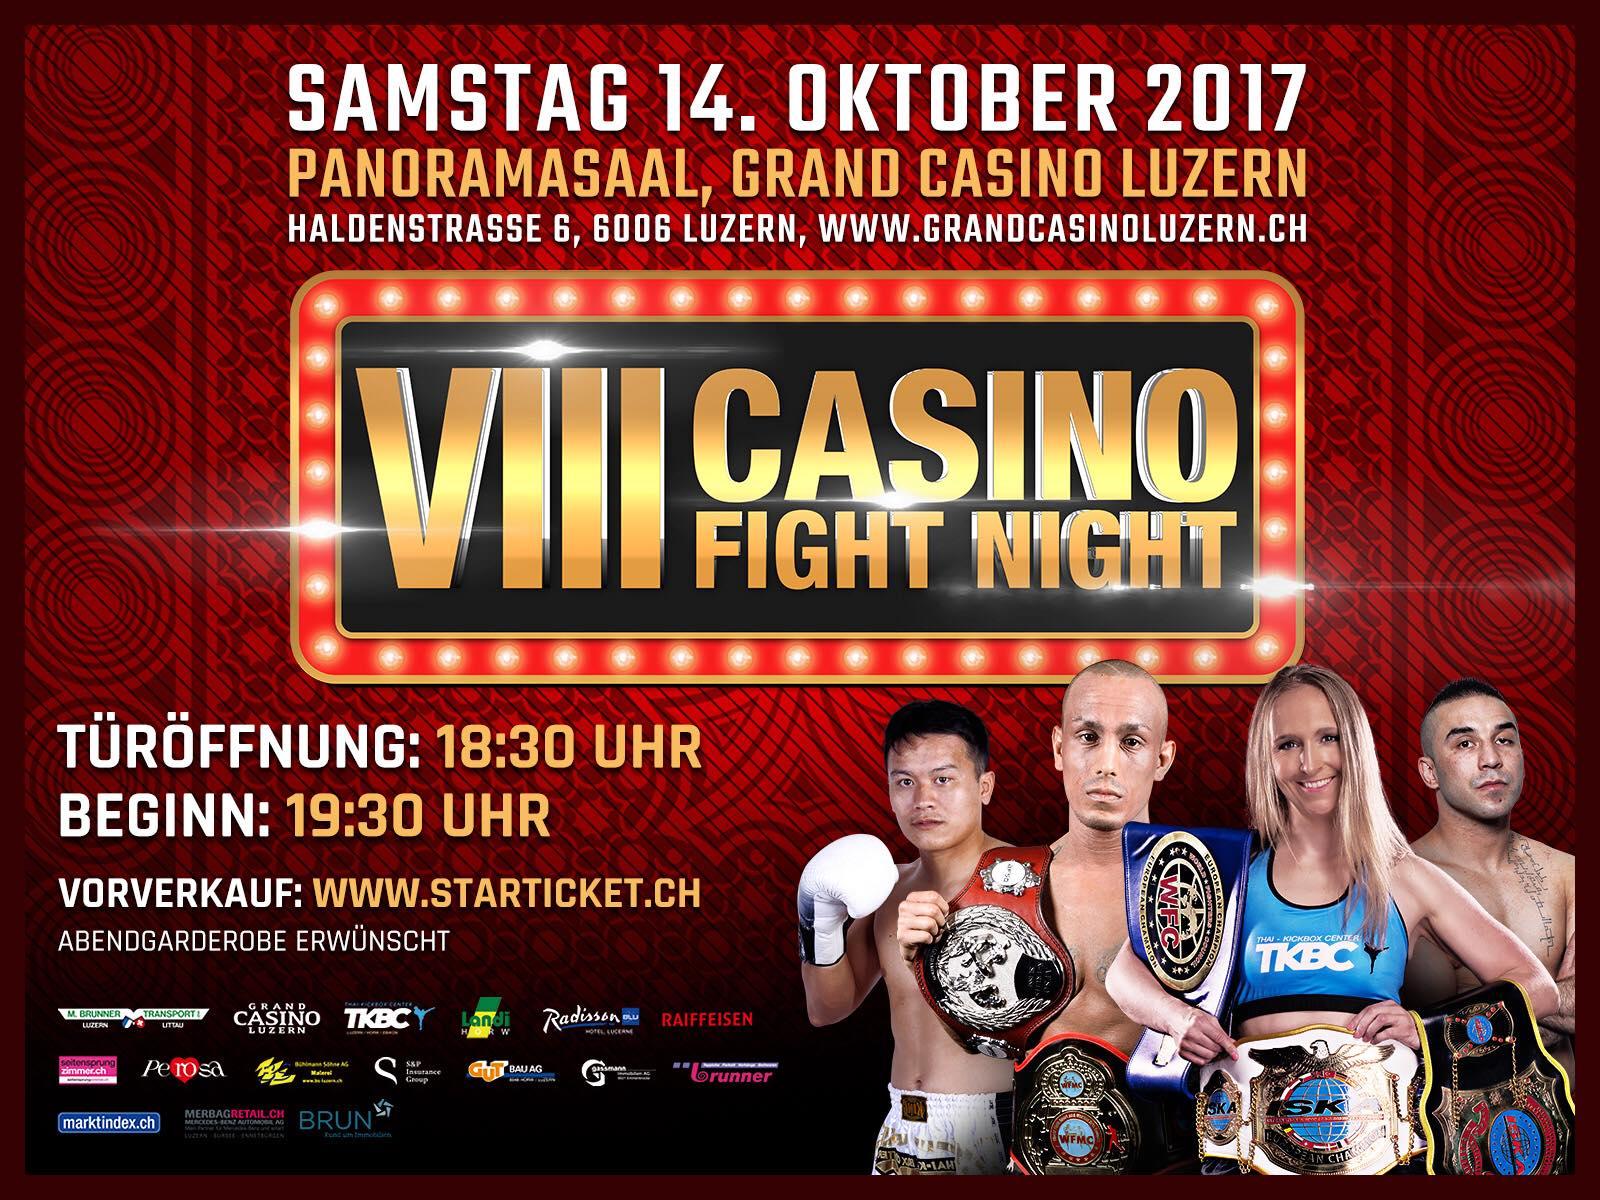 Casino fight 2015 sycuan casino carey hart